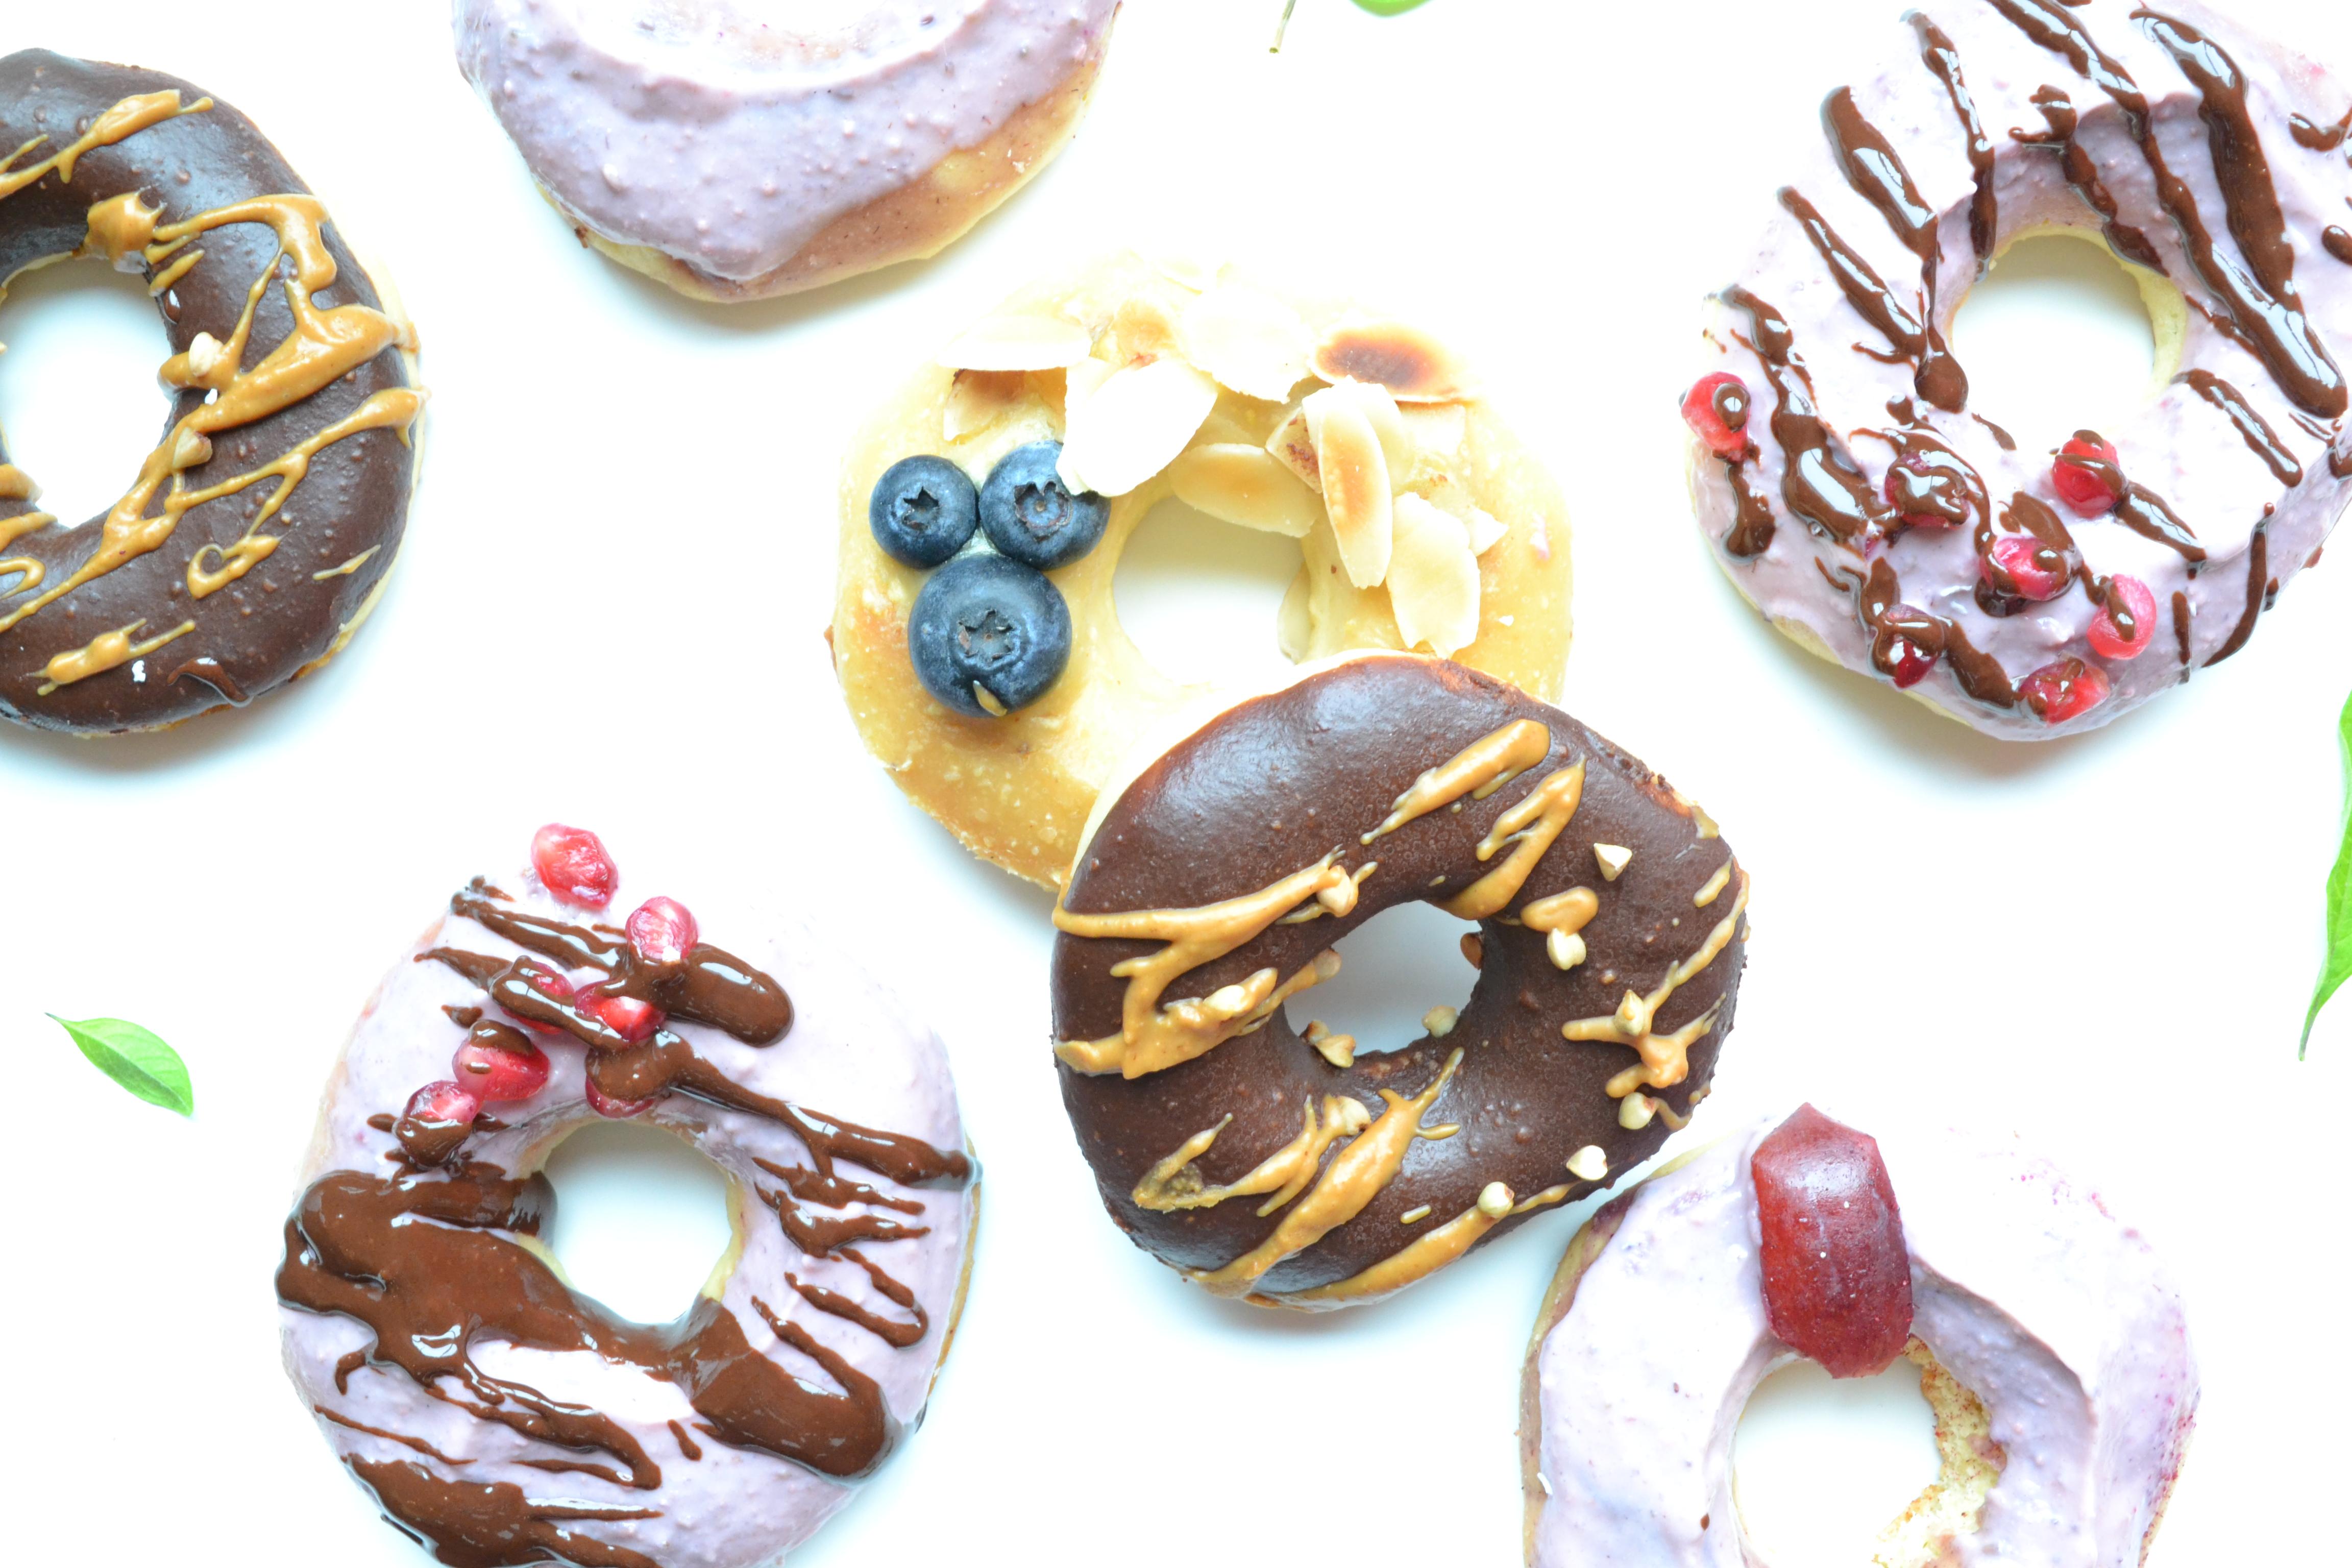 Donuts sans sucre raffiné ni friture